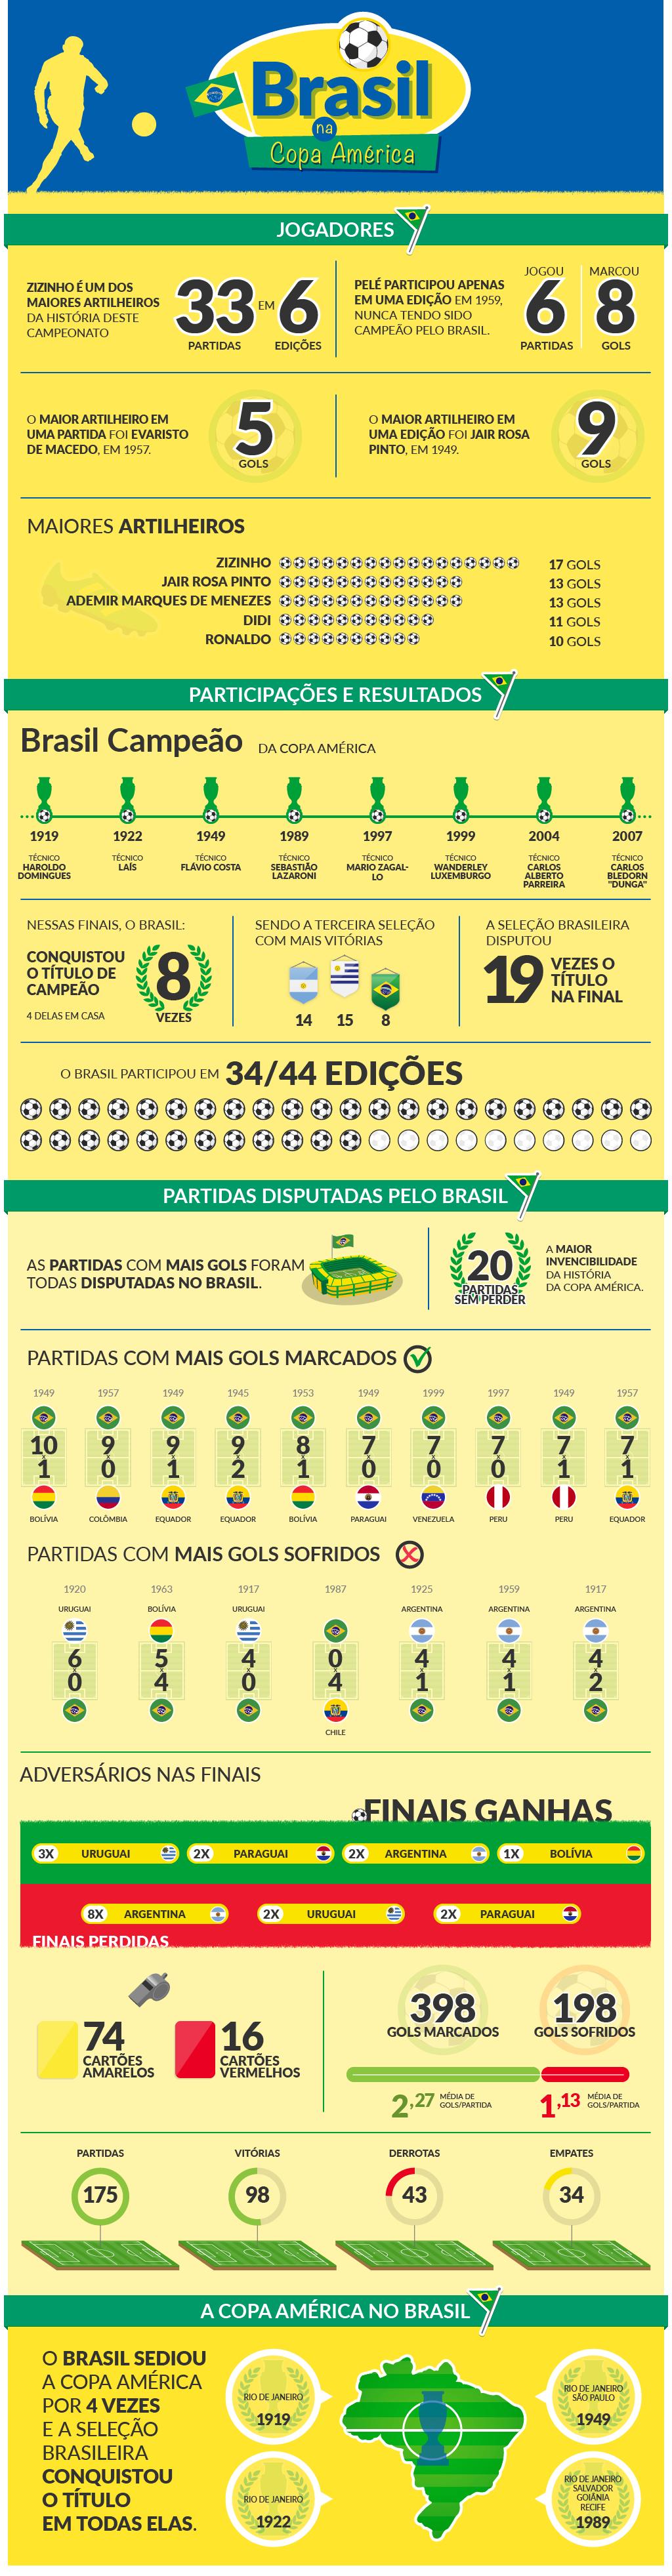 Infográfico traz curiosidades sobre o Brasil na Copa América